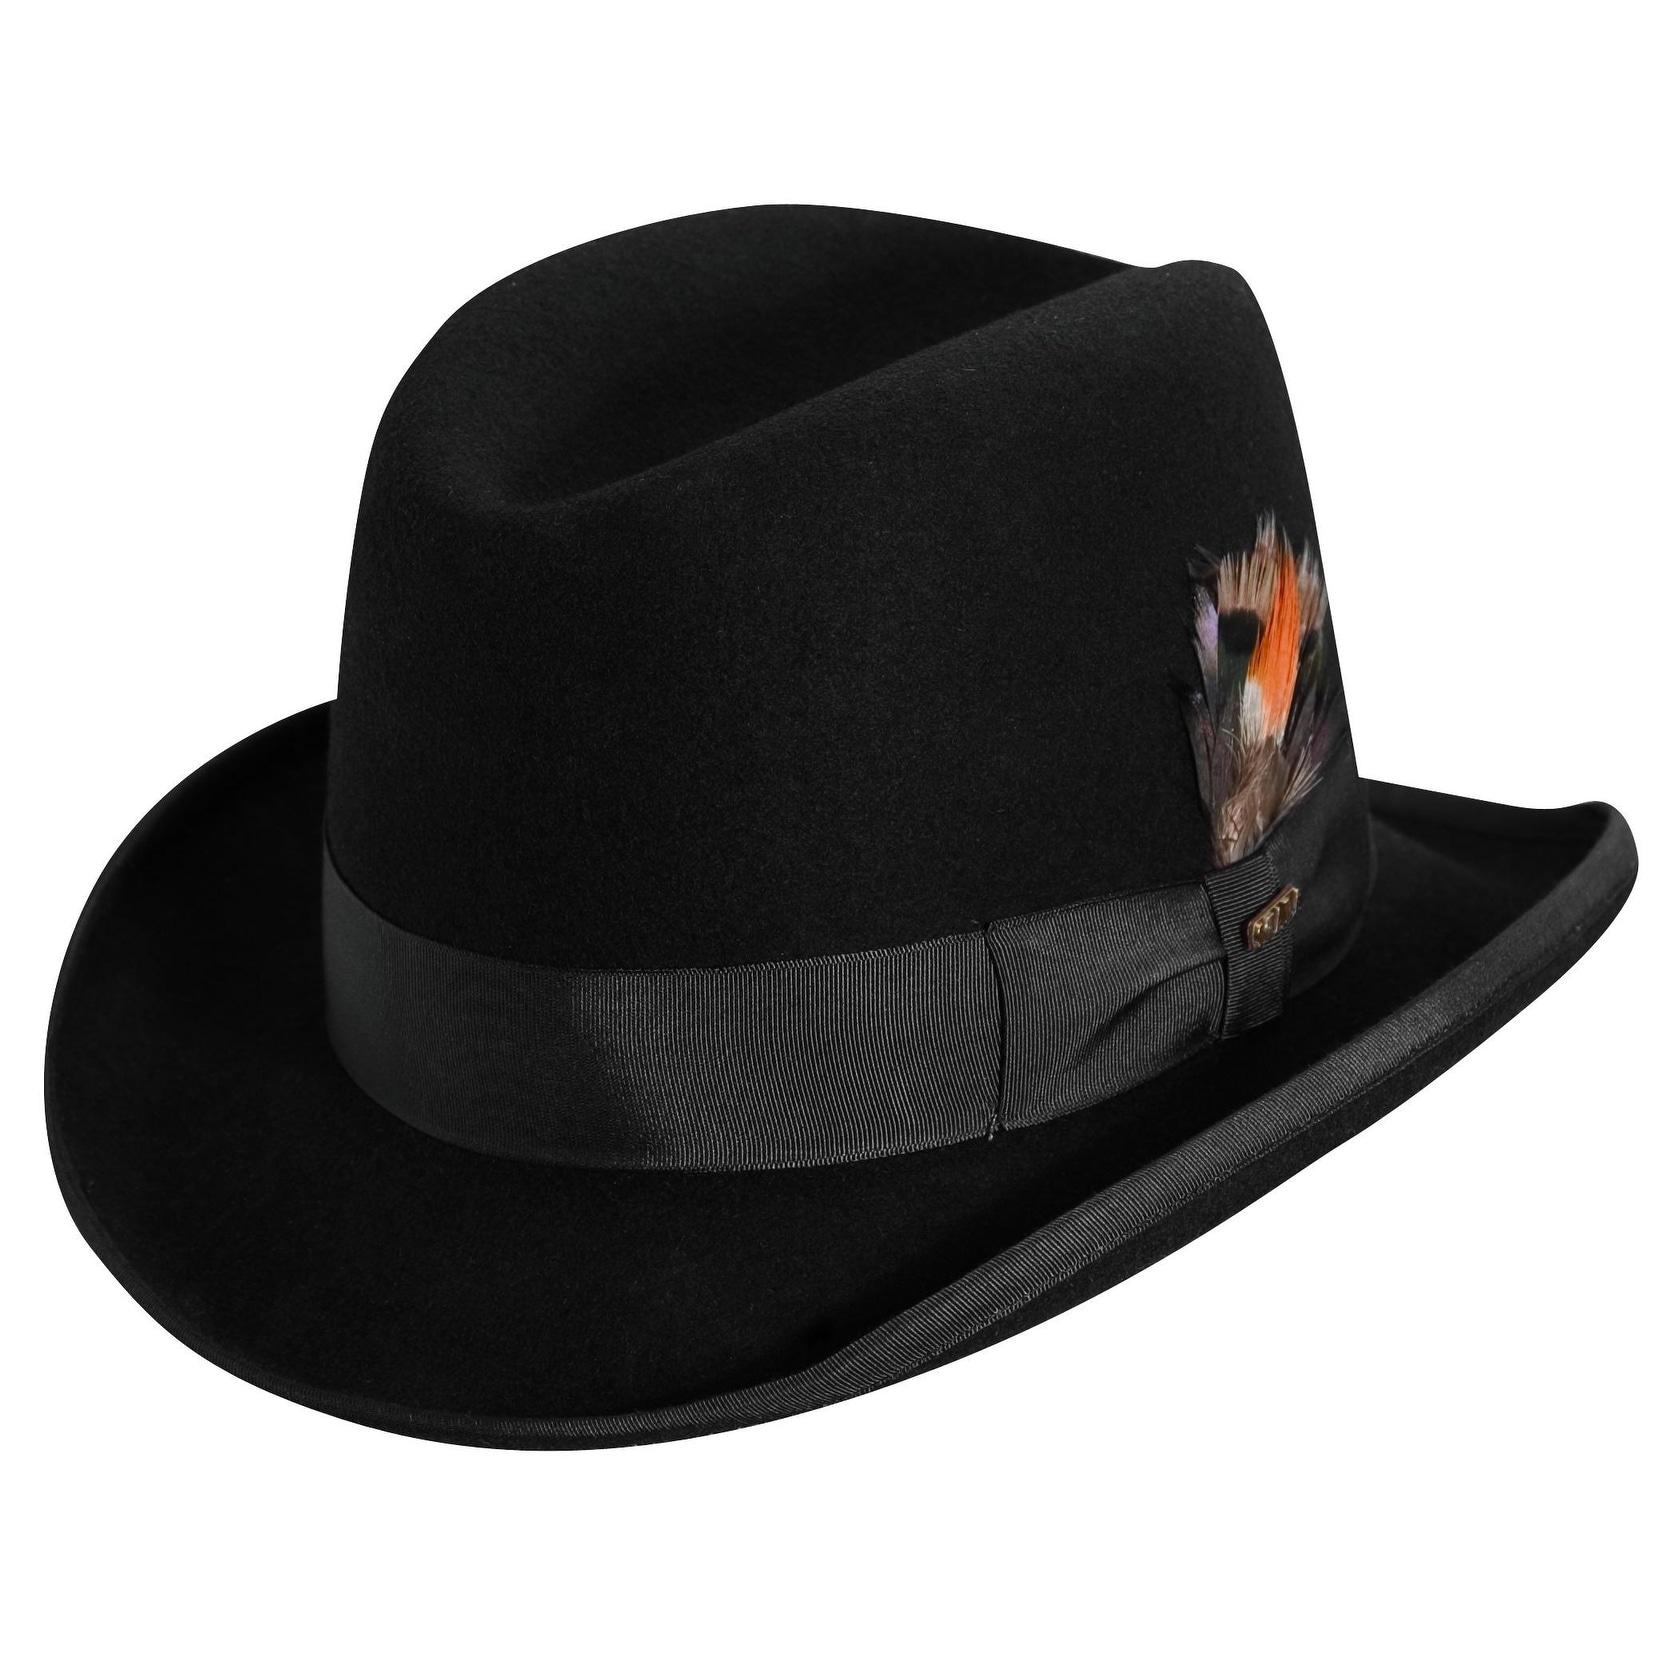 89bf6aae8 Scala Men's Wool Felt Winter Homburg Hat